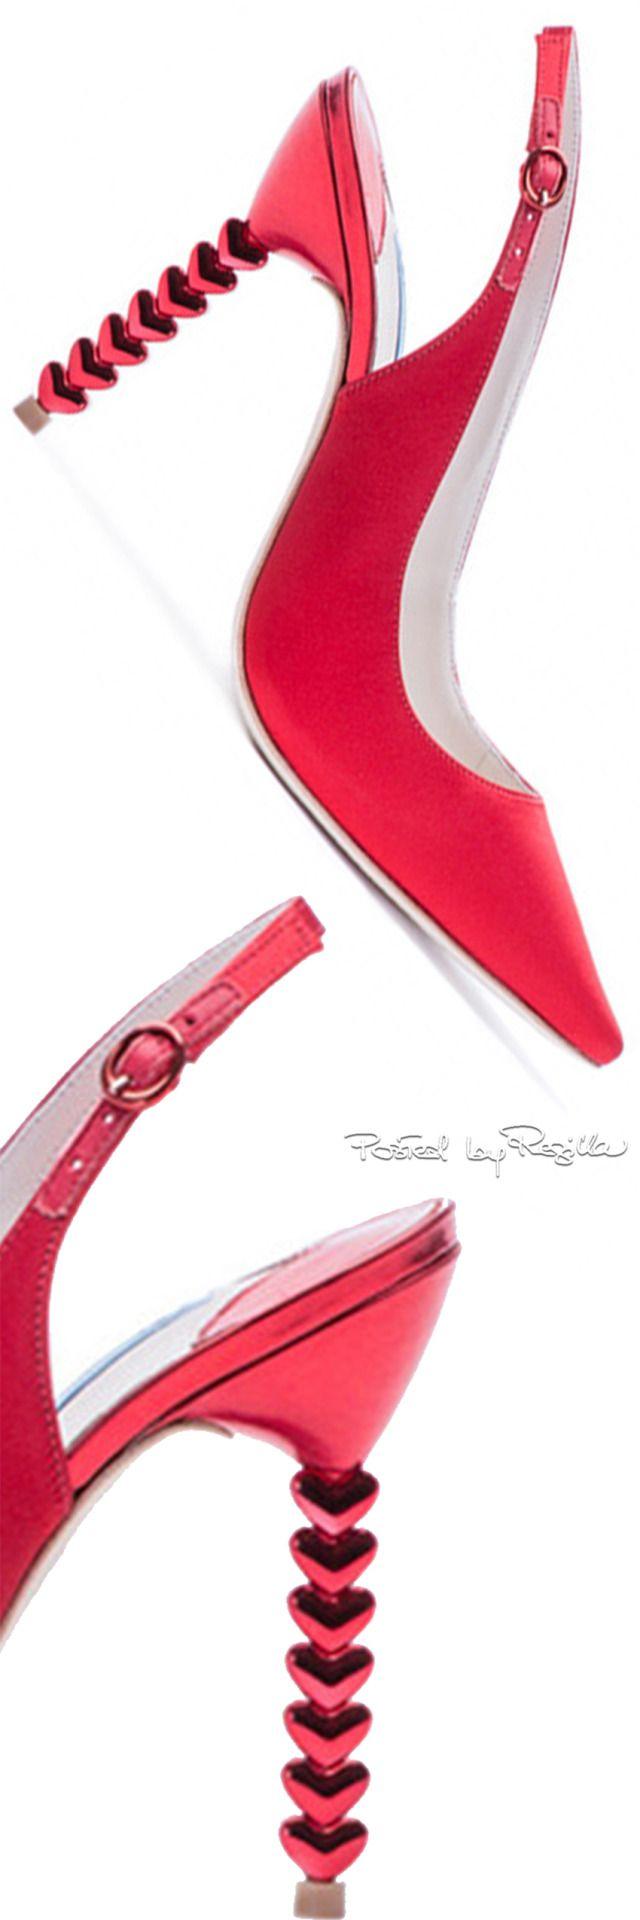 Sophia Webster ~ Tyra Heart Heels, Cherry Red, 2015